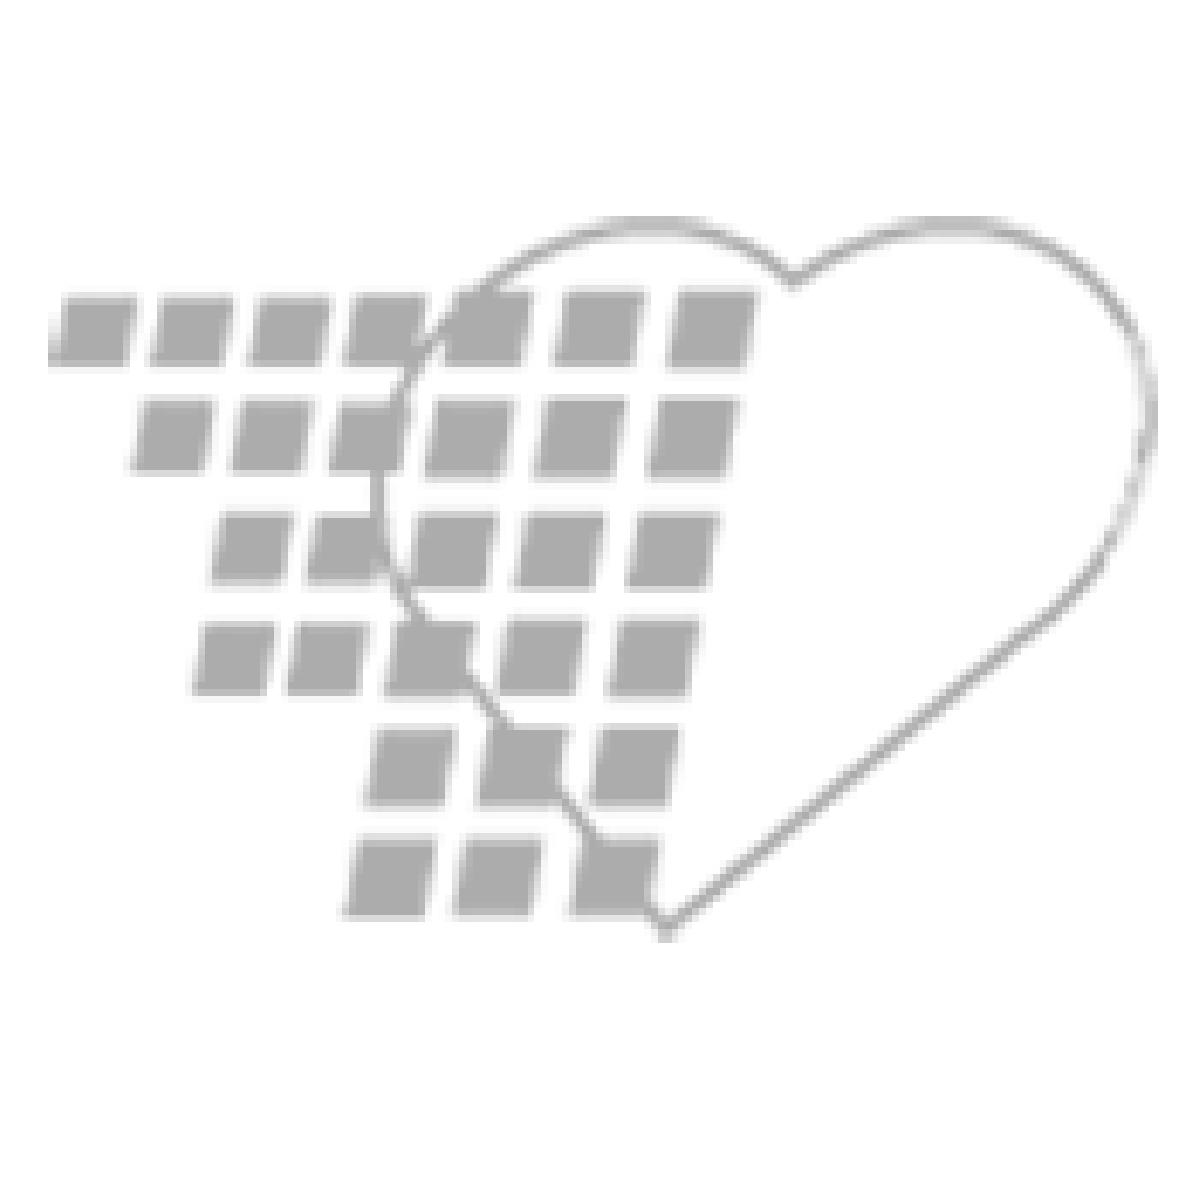 09-79-4501 Gaumard CD Perinatal Monitors Simulation Software with Scenario Builder Non-Returnable